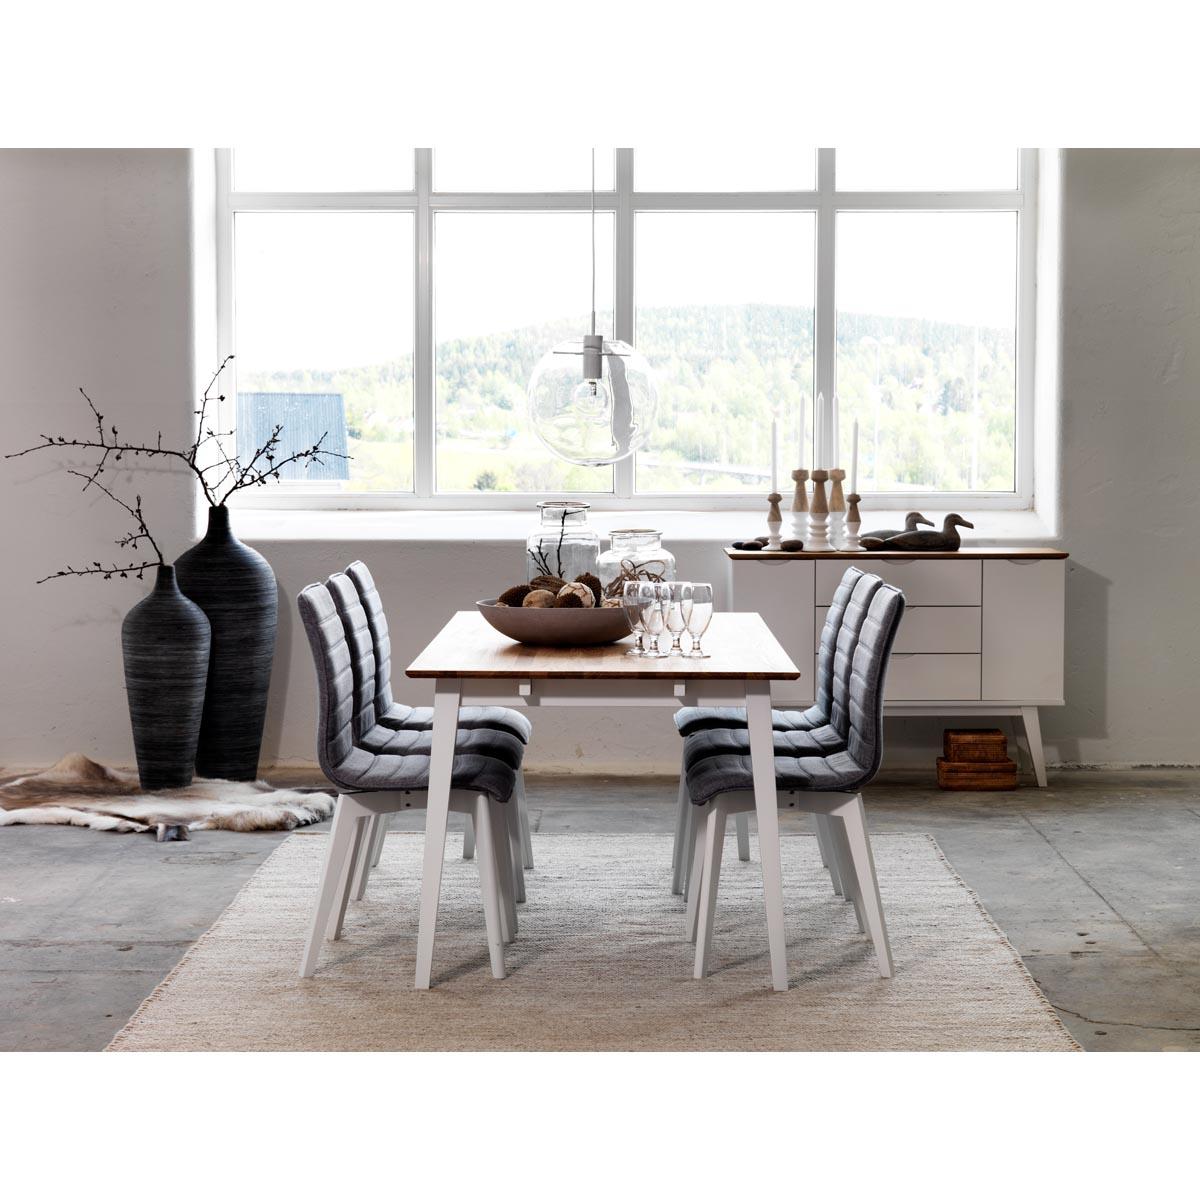 Vasa-bord_Febe-stol-miljö-113610_113623